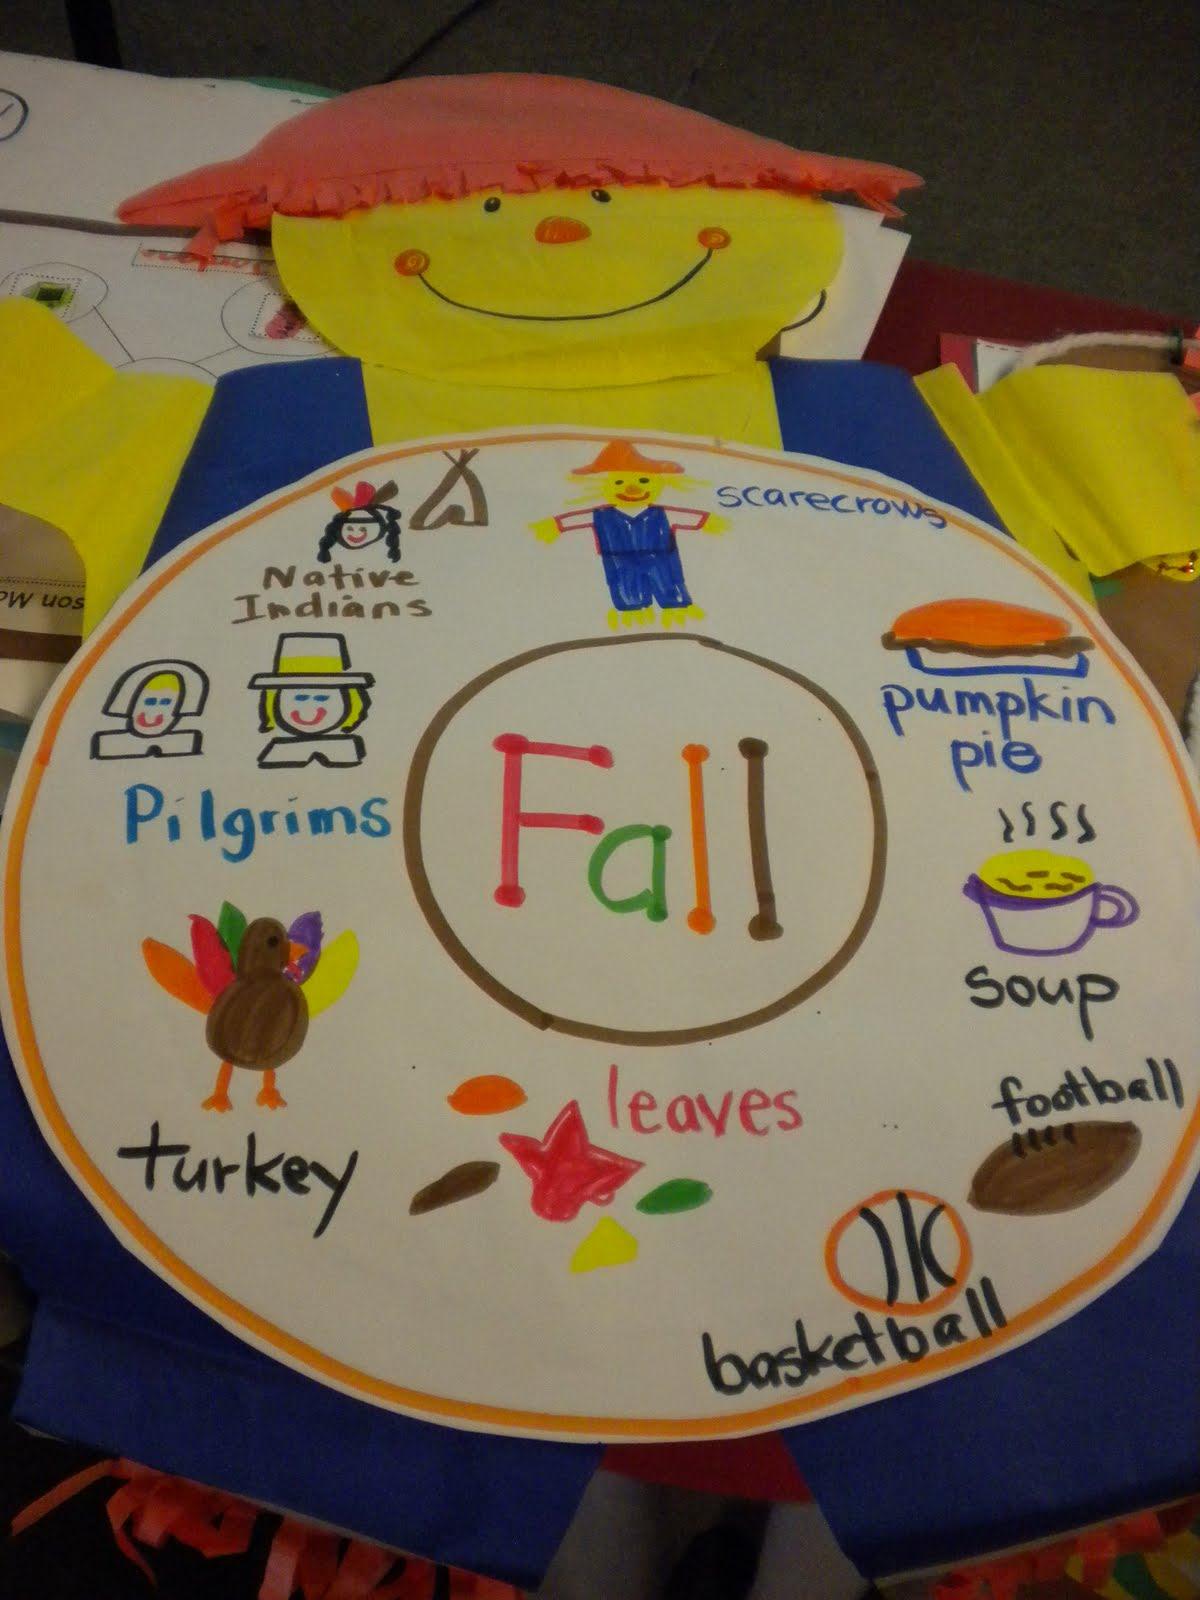 Kinder Garden: Chalk Talk: A Kindergarten Blog: October 2010